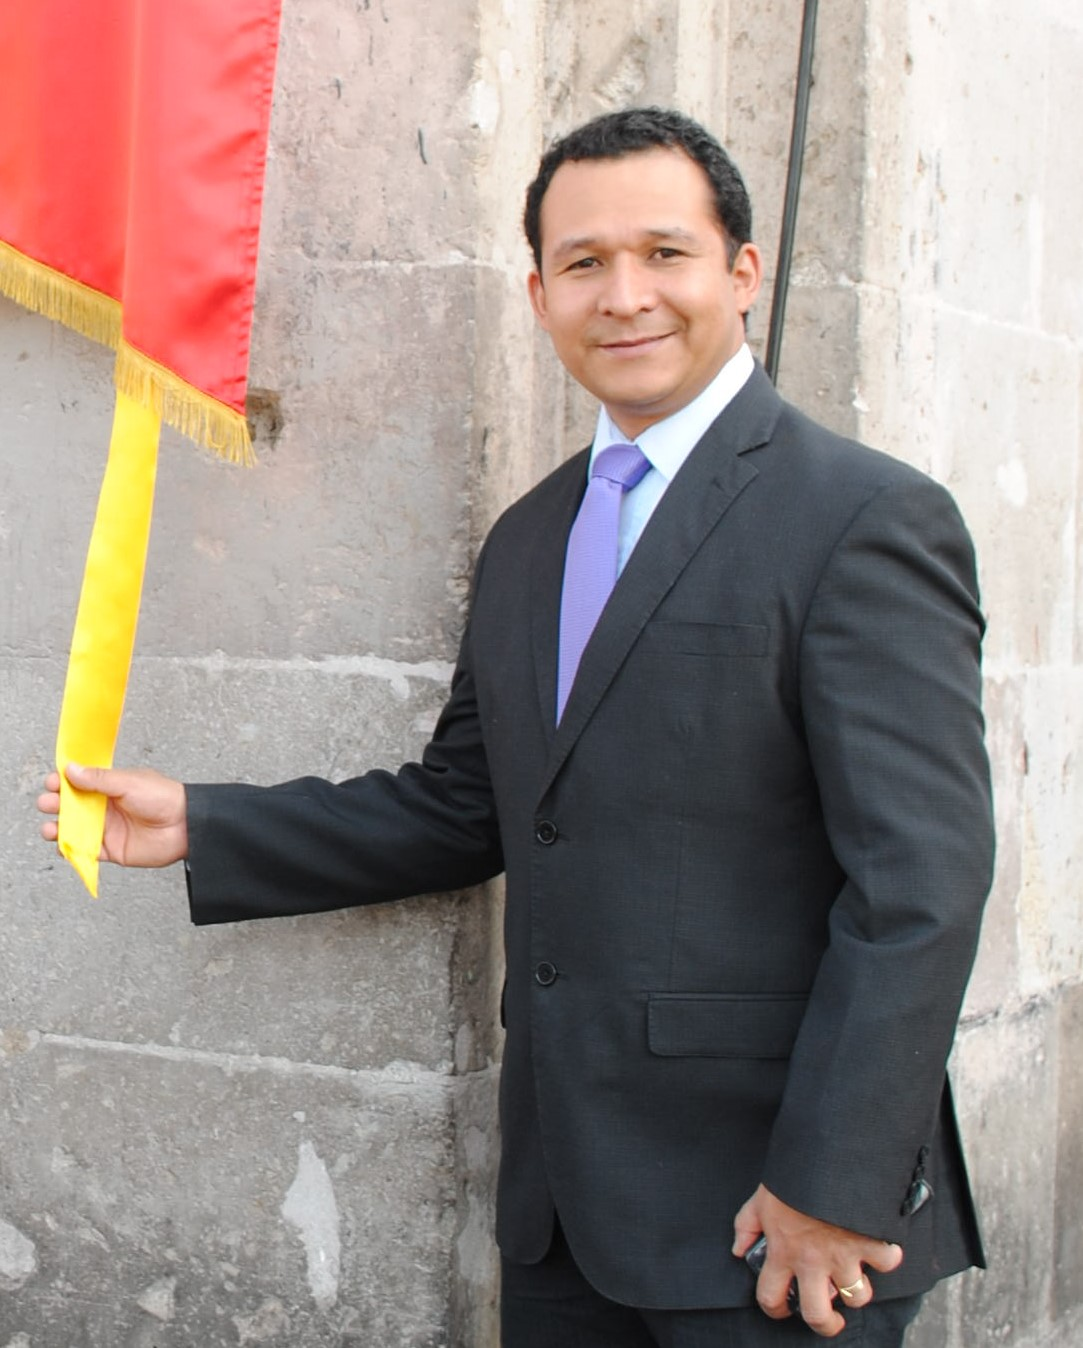 Horacio Erik Avilés Martínez / Quadratín